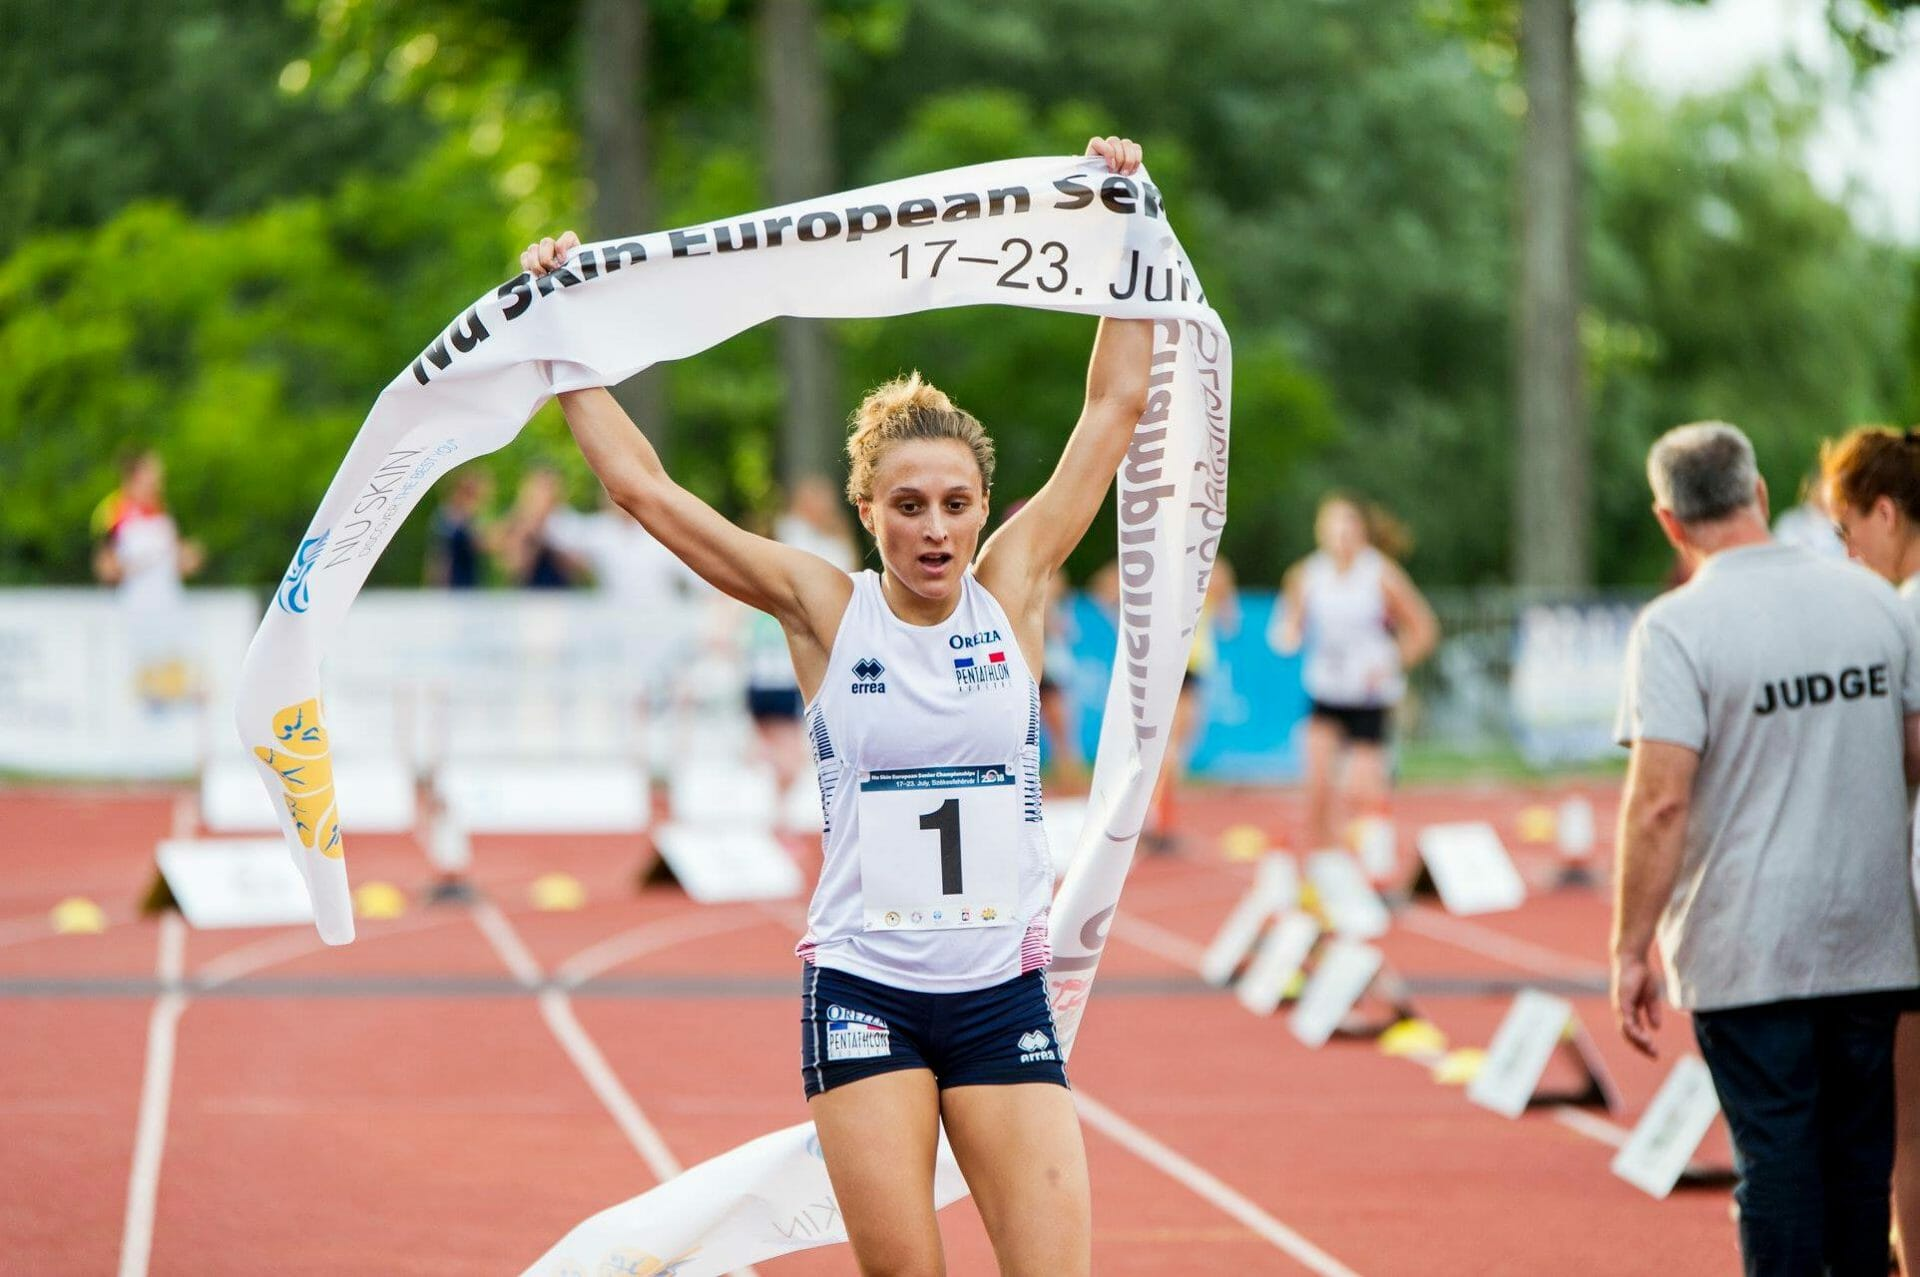 Beside Sport - Marie Oteiza, la pentathlète d'aujourd'hui et de demain -  -